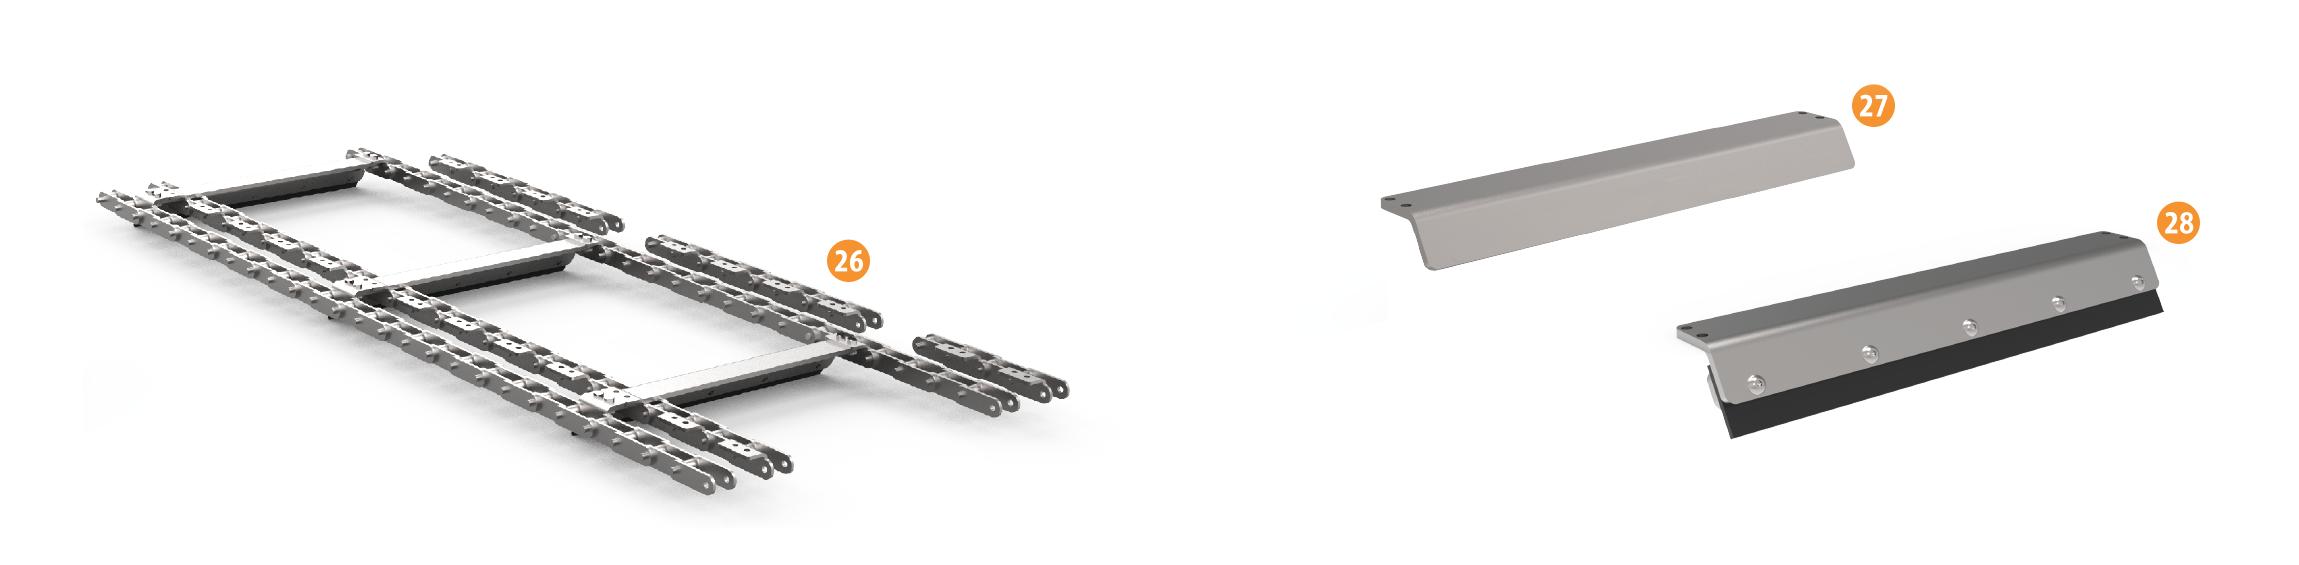 Chip Conveyor Spare Parts - Belt Assemblies & Kits   Hennig Inc